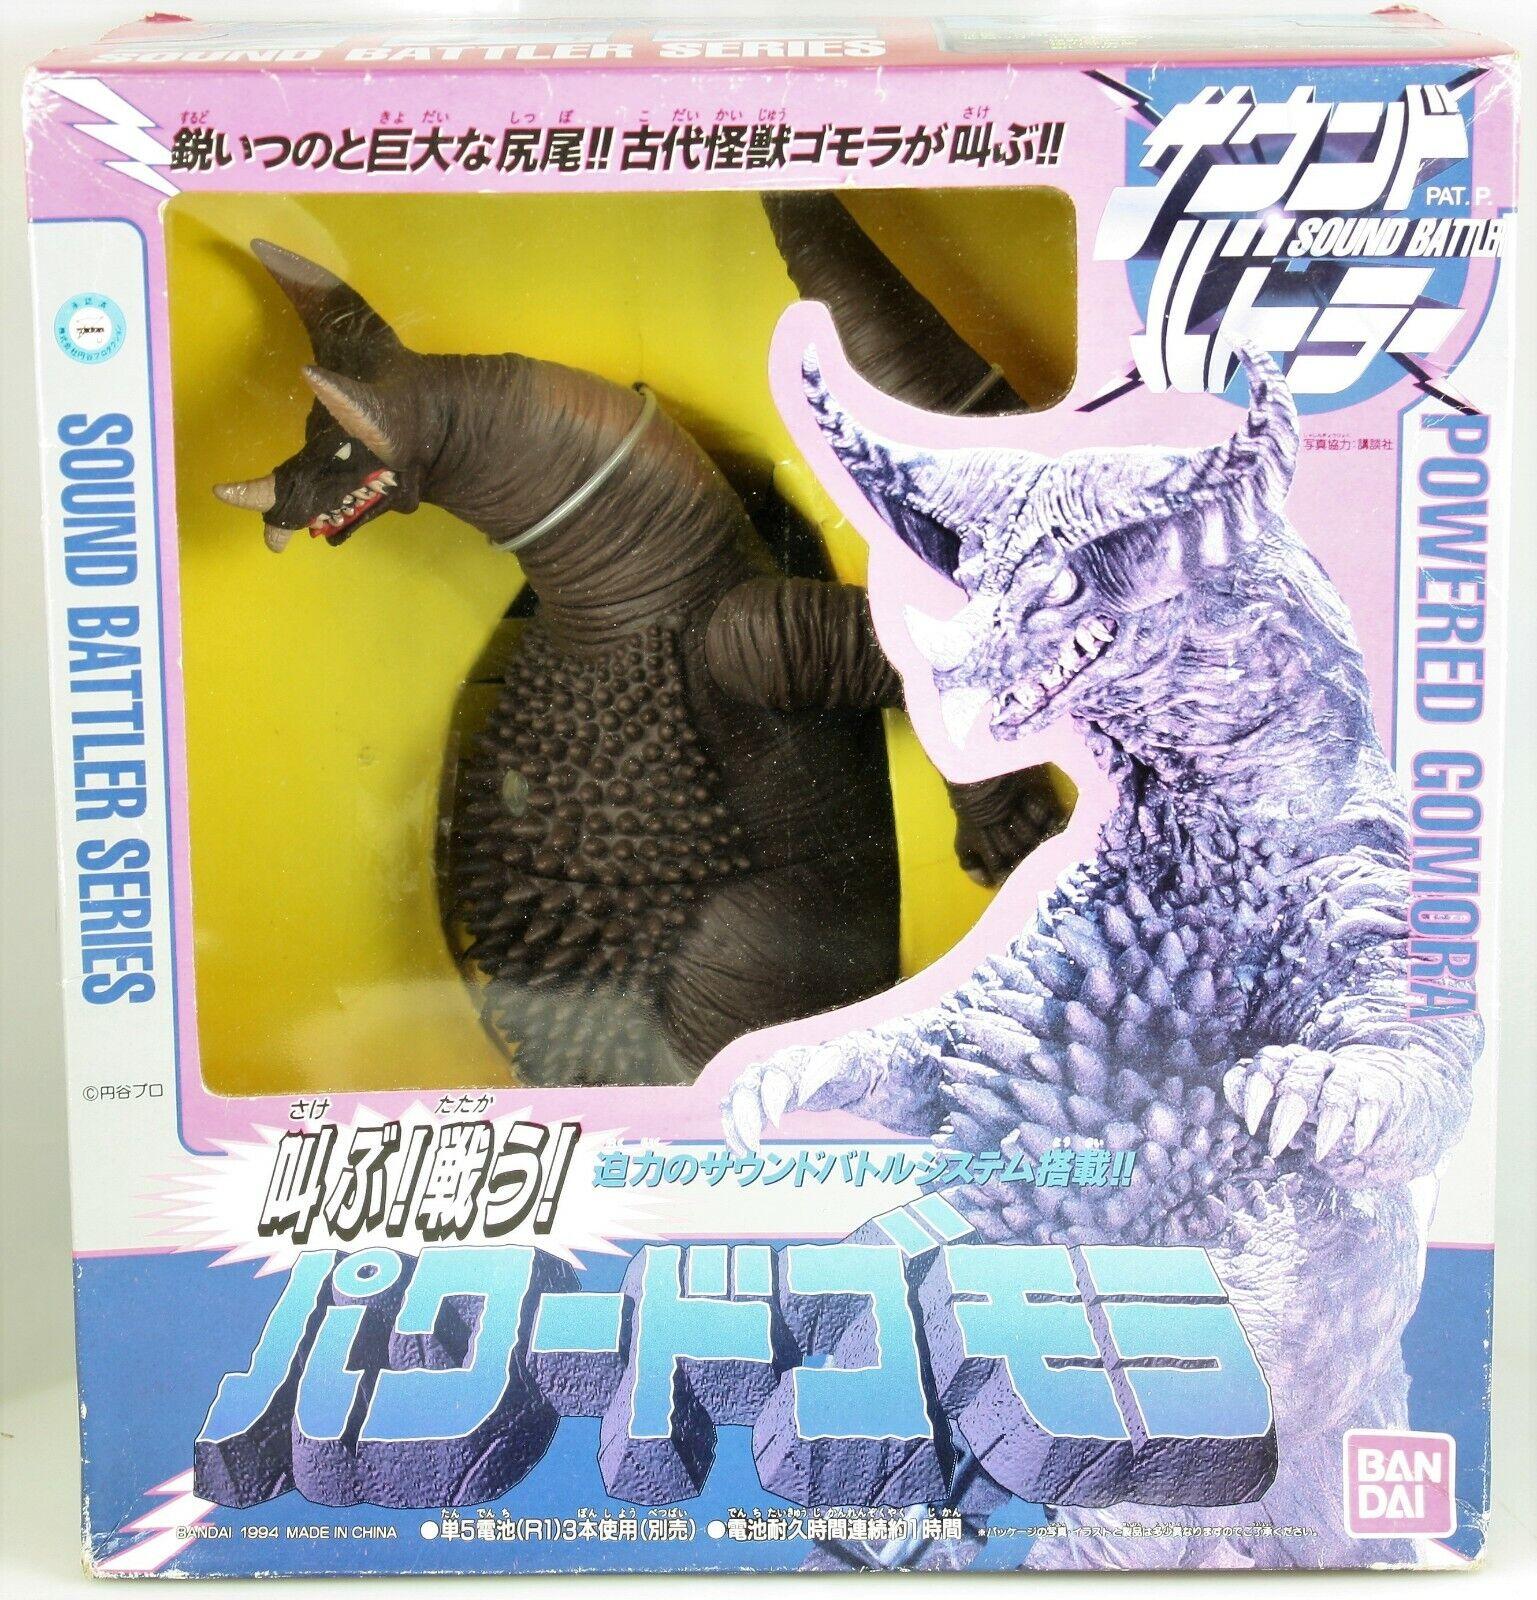 Energiaosso Gomora suono Battler Series 11   cifra +scatola BeAI Ultrauomo Kaiju  design semplice e generoso